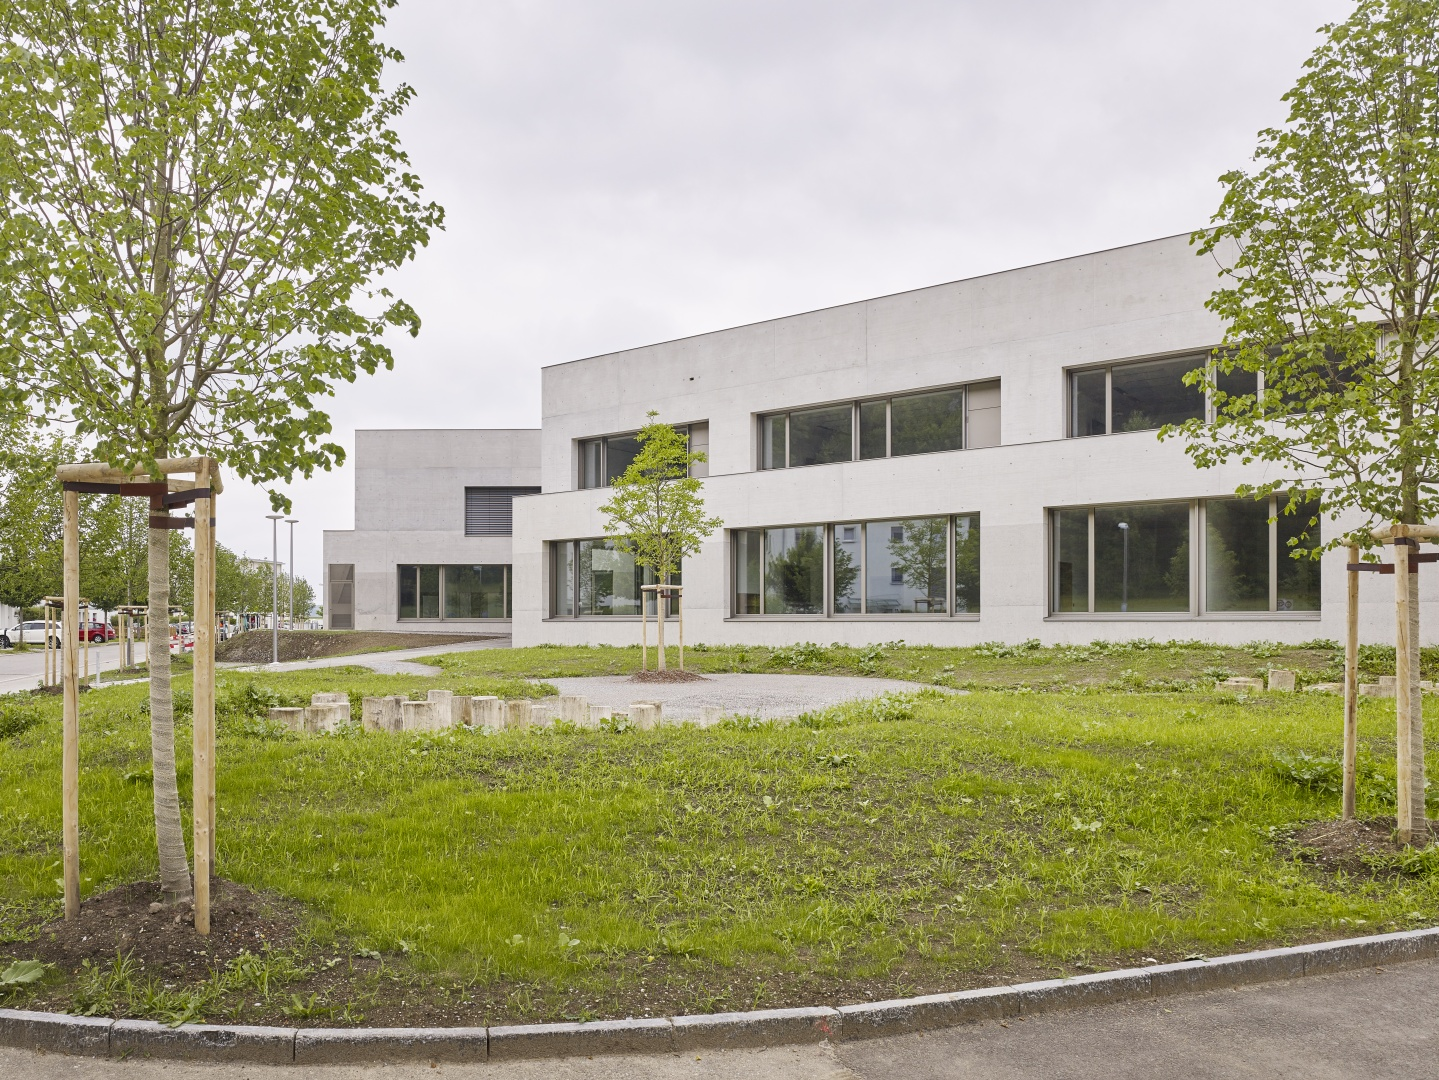 Schulhaus Zinzikon, Schulhaustrakt © Roland Bernath, Zürich